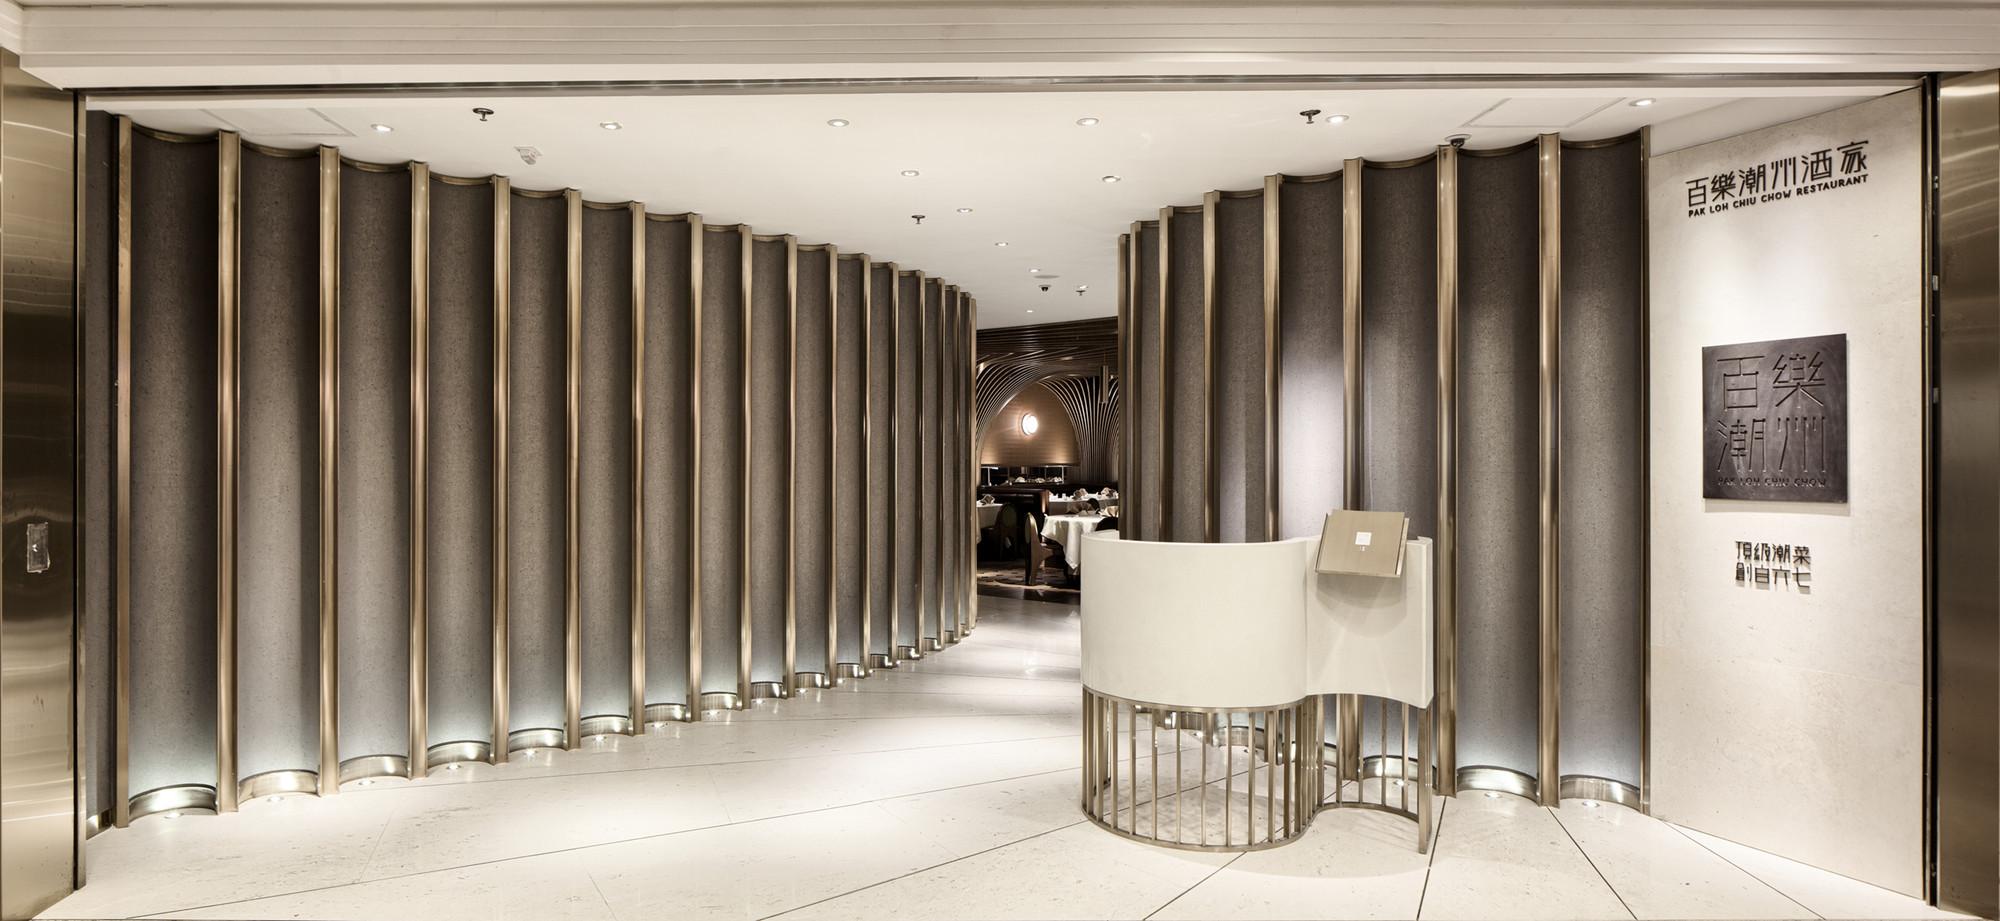 Pak loh times square restaurant nc design architecture